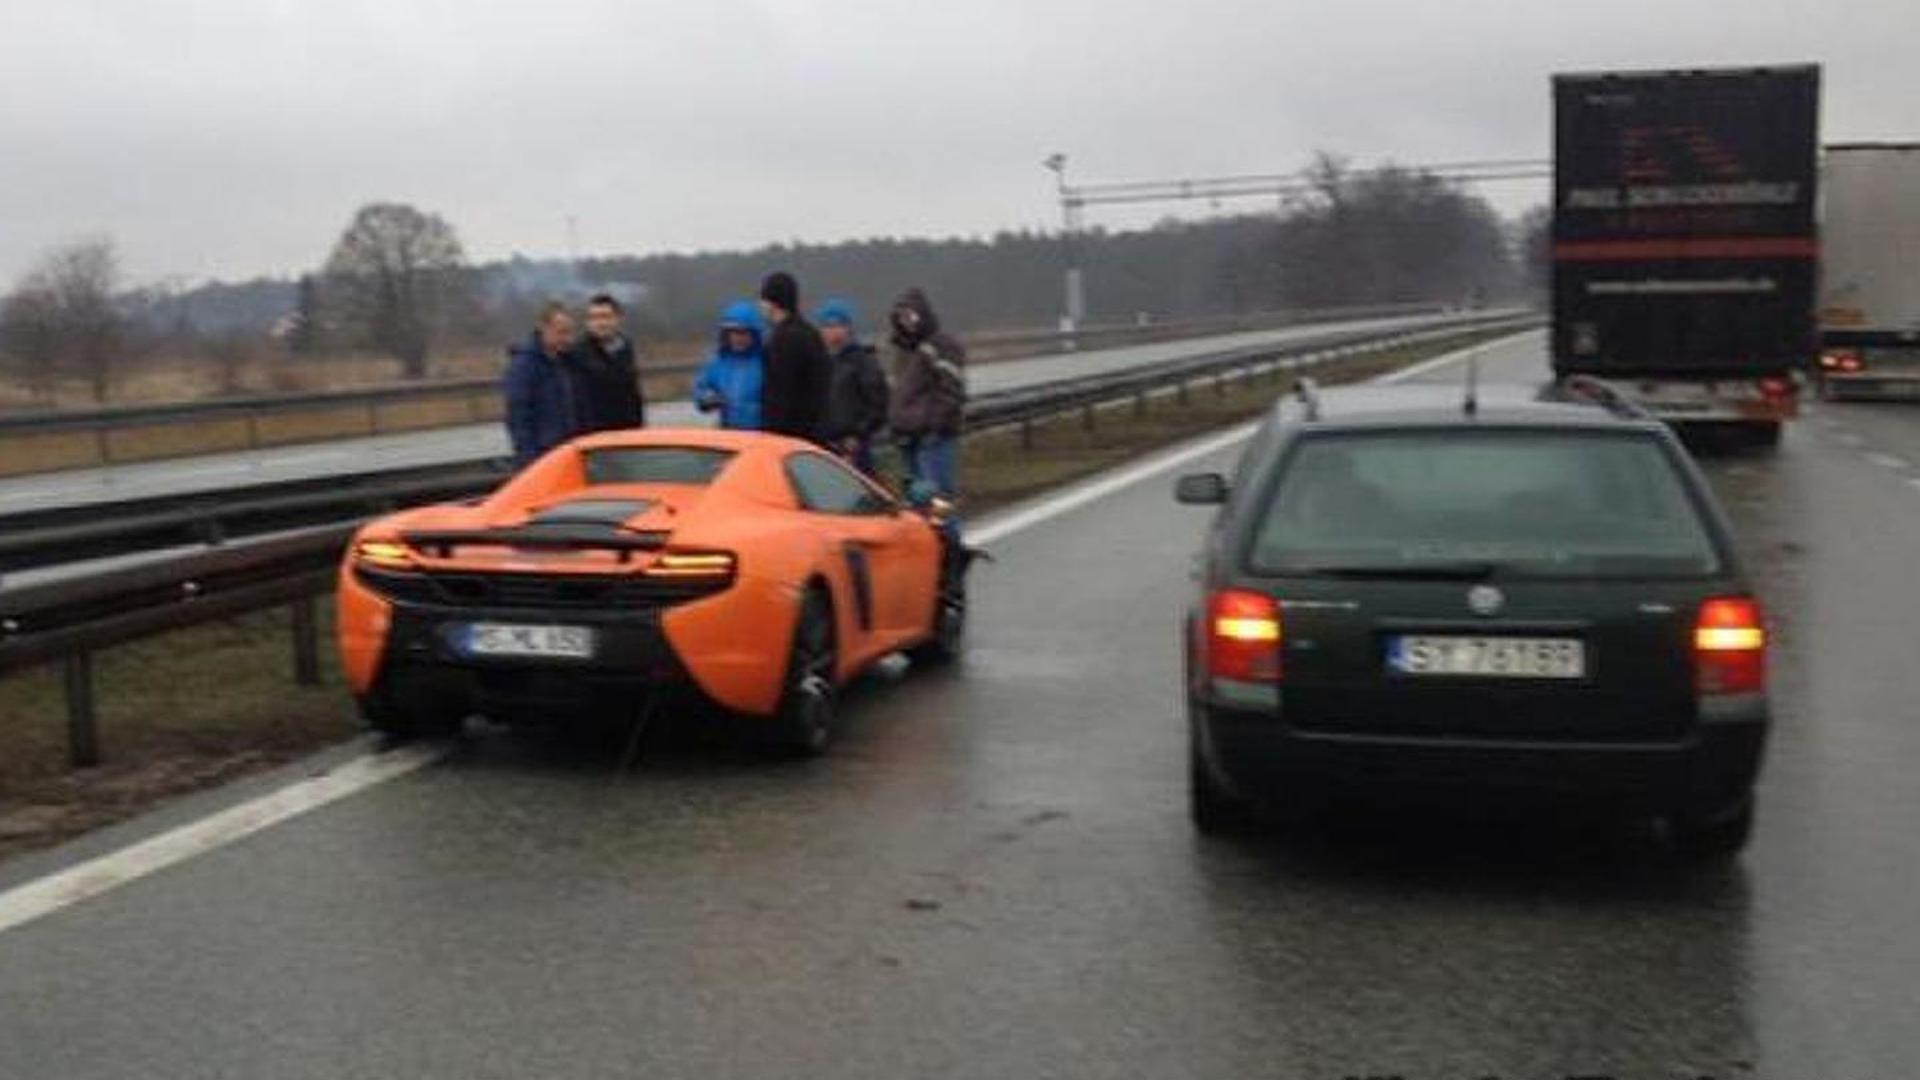 McLaren 650S crashes on a rainy highway [video]